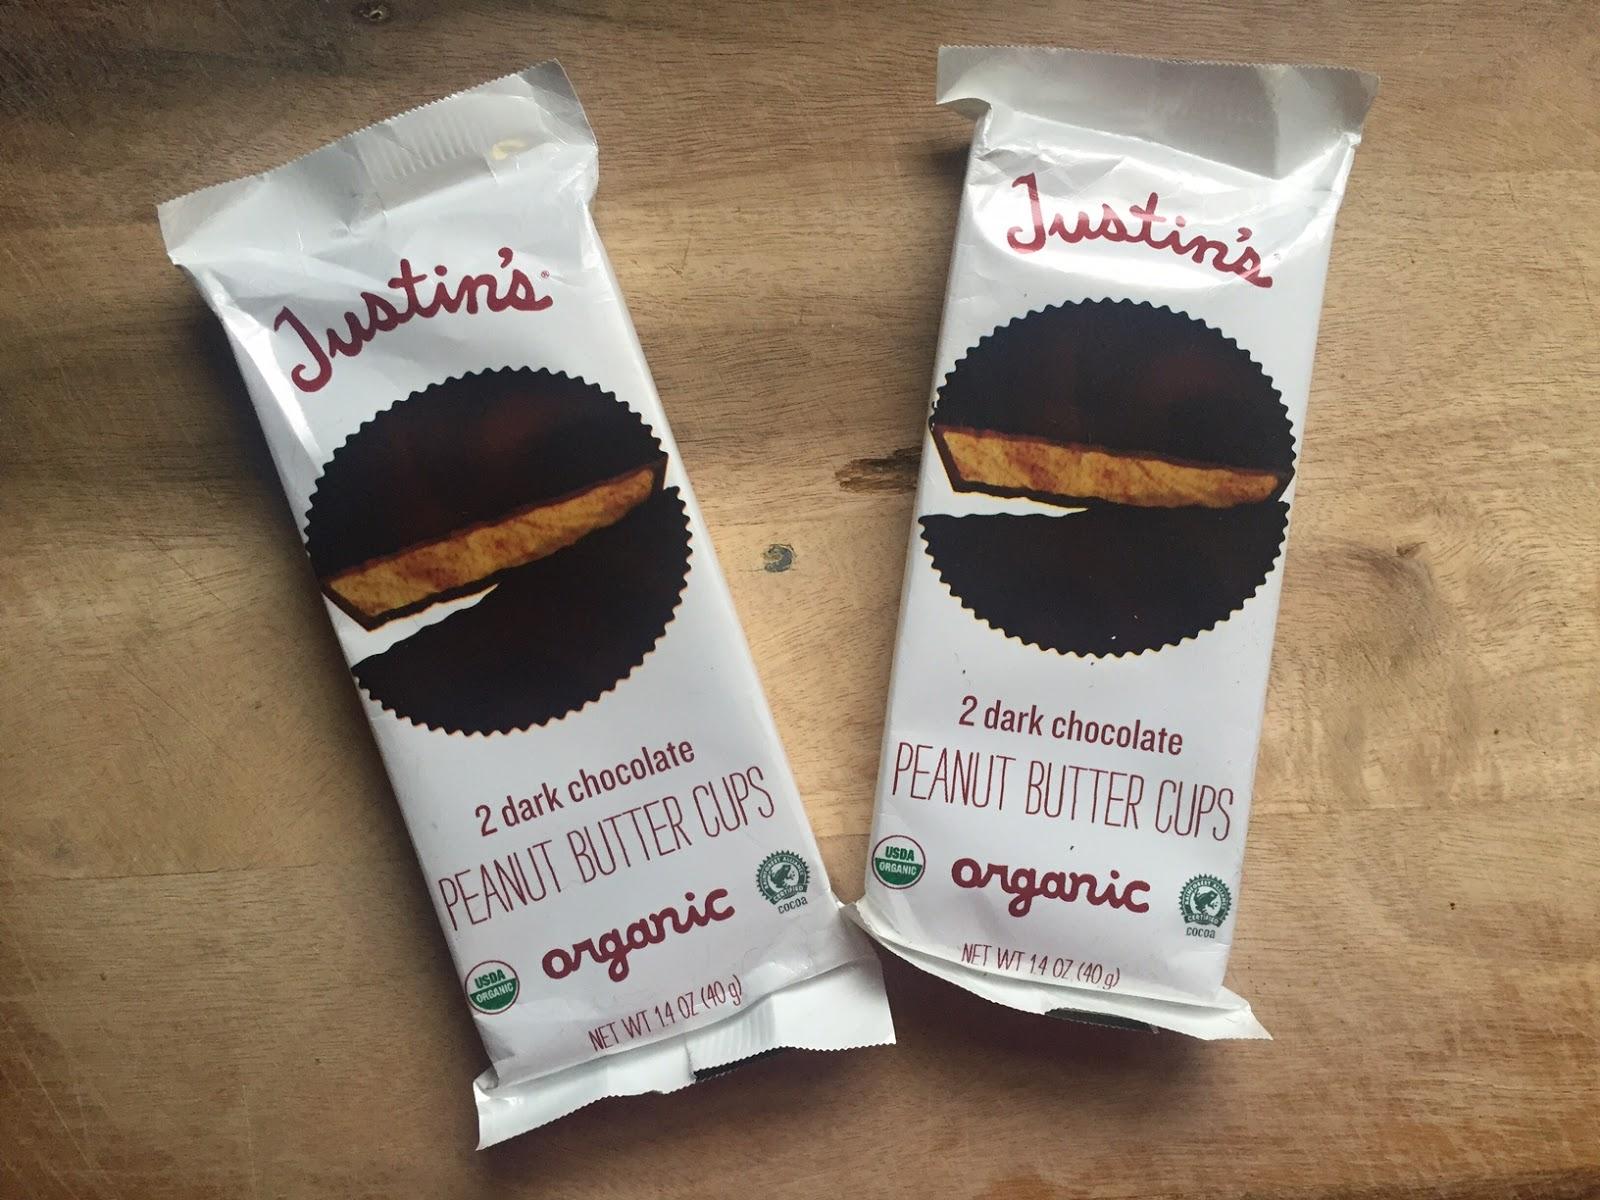 Vegan Crunk: Justin's Dark Chocolate Peanut Butter Cups Are Vegan!!